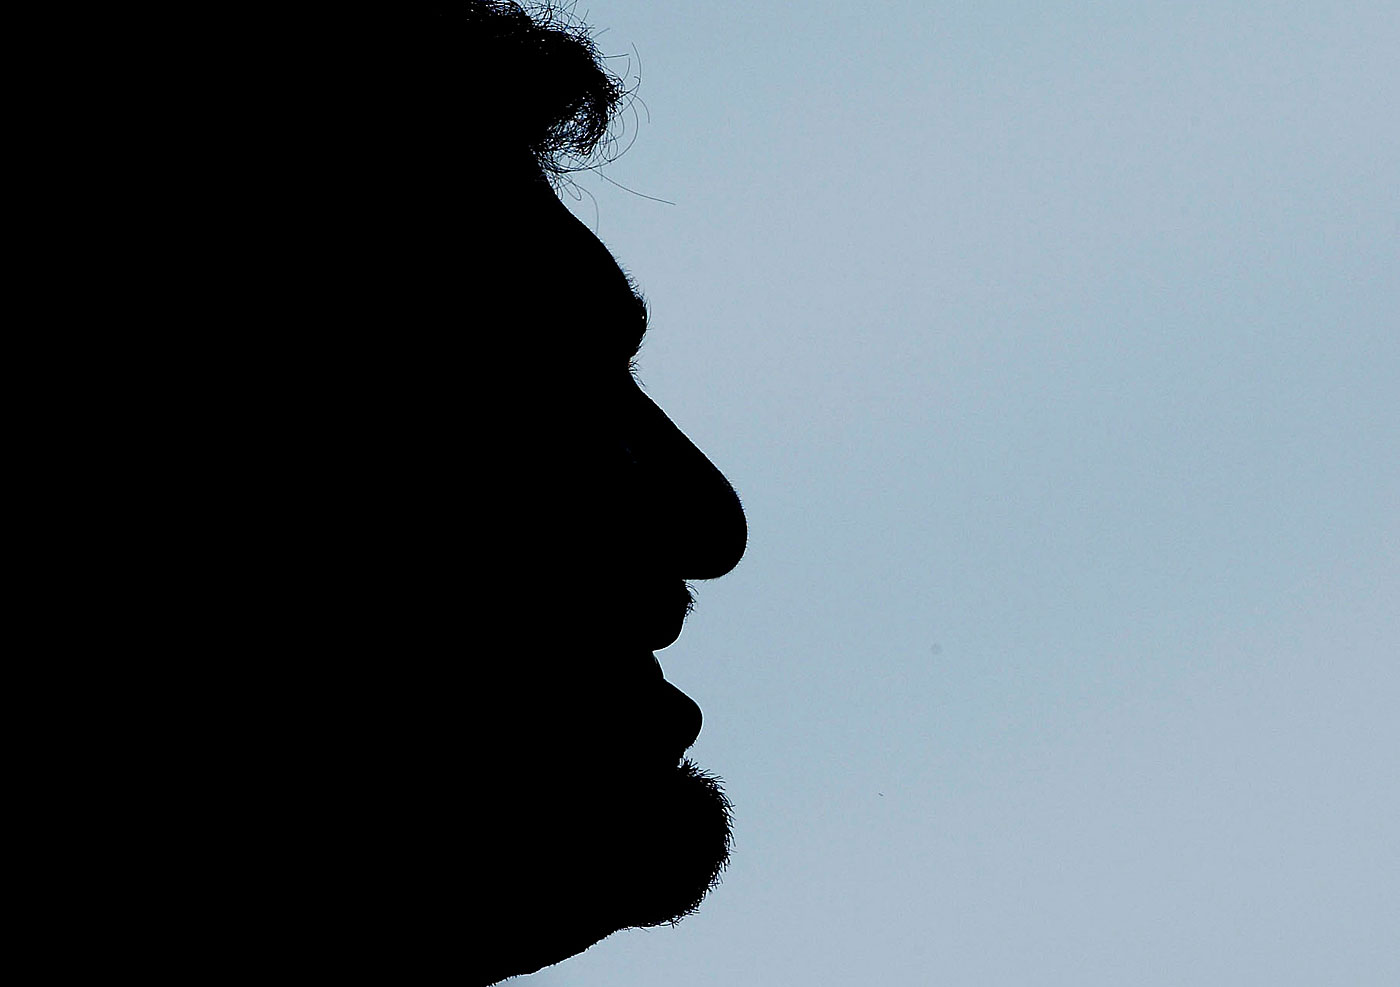 Silhouette of Muttiah Muralitharan